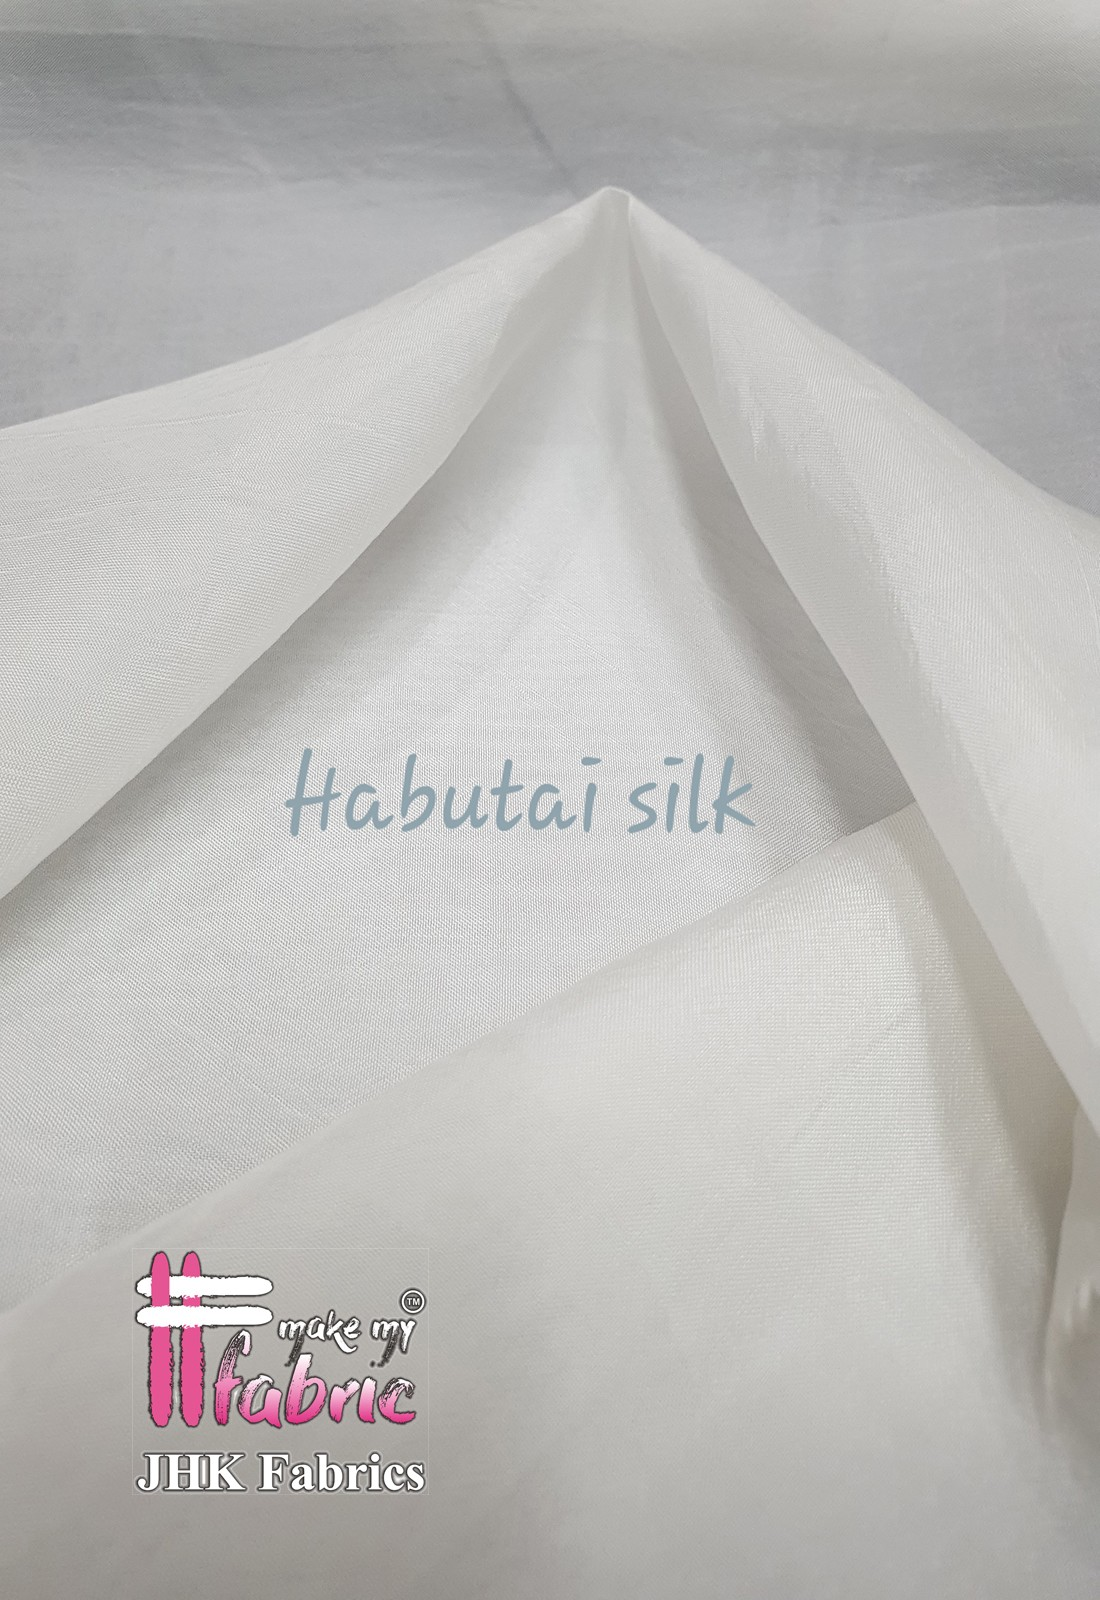 Habutai Silk